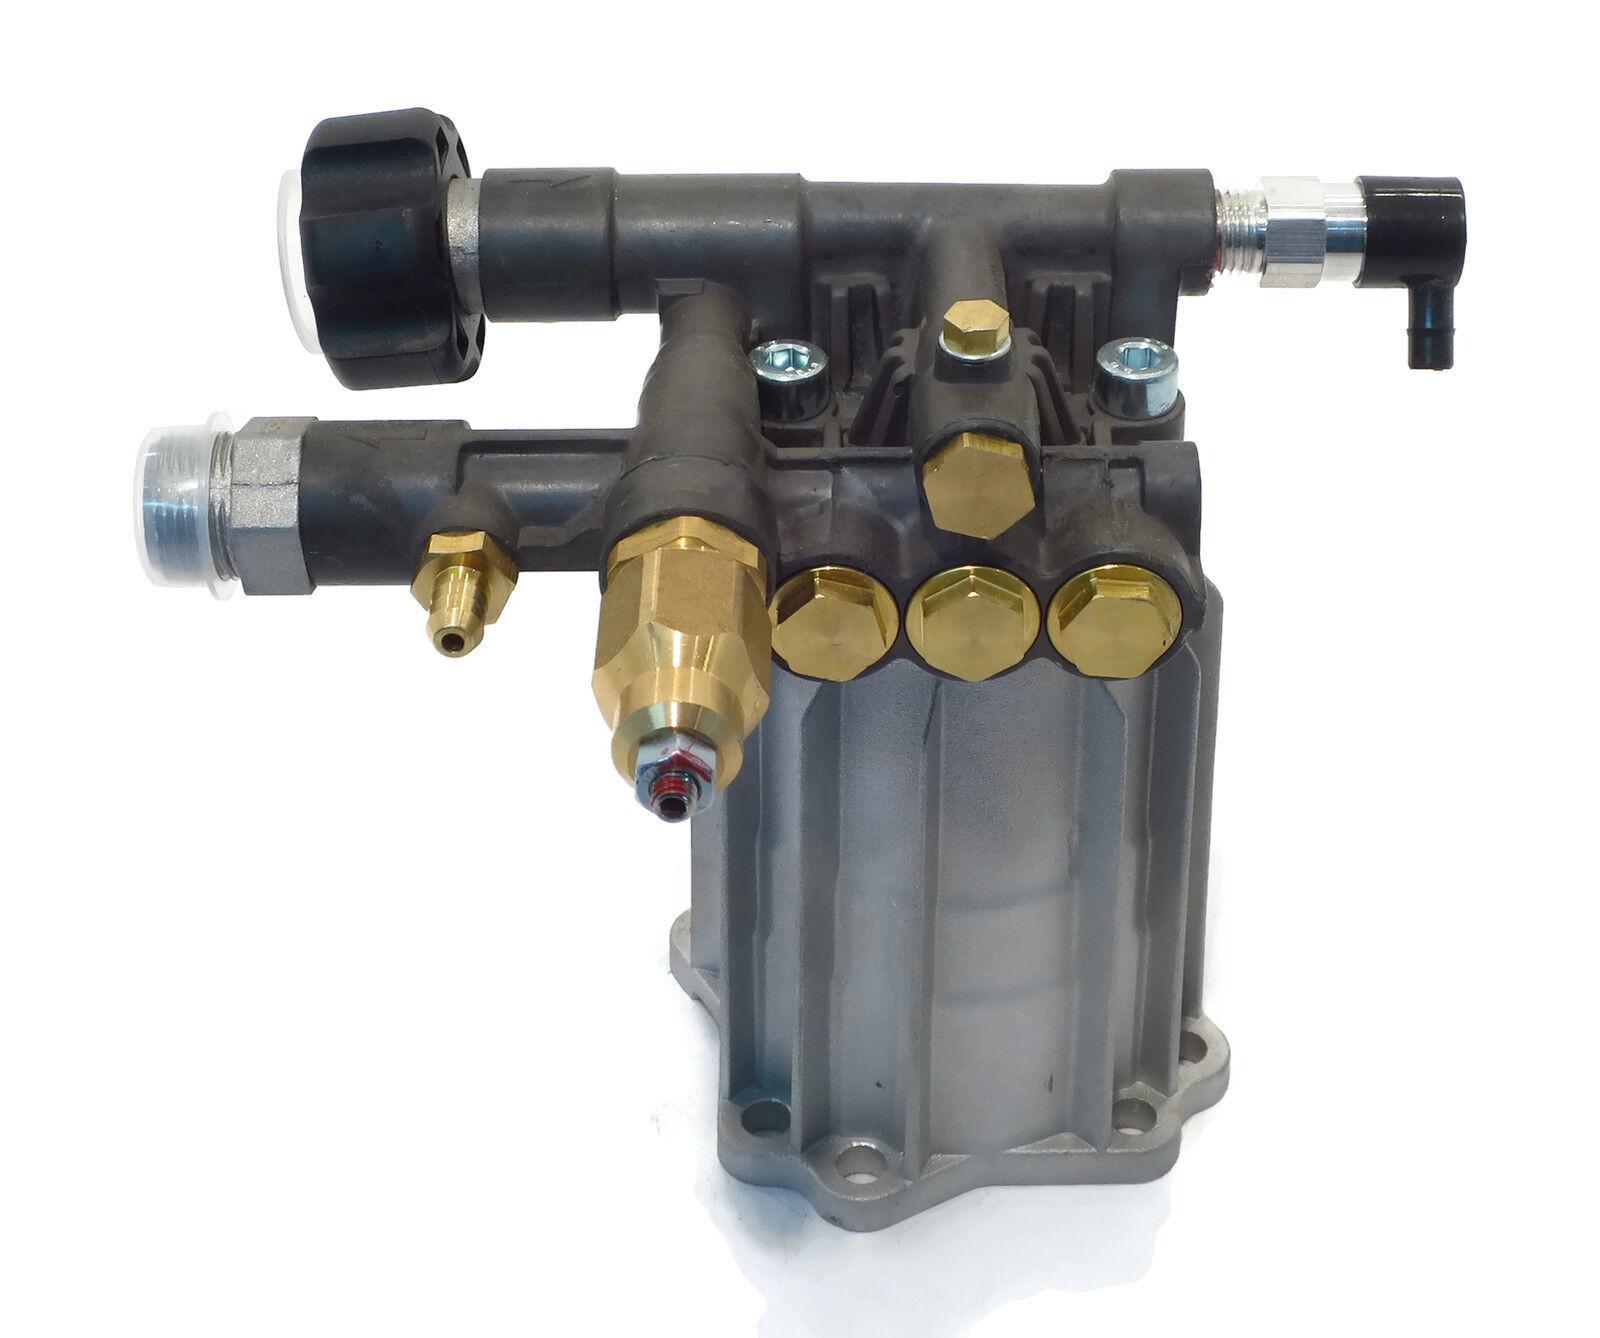 VÖLKEL BSP Weissring Maschinengewindebohrer DIN5156 Form C//39° Stahl hochlegiert